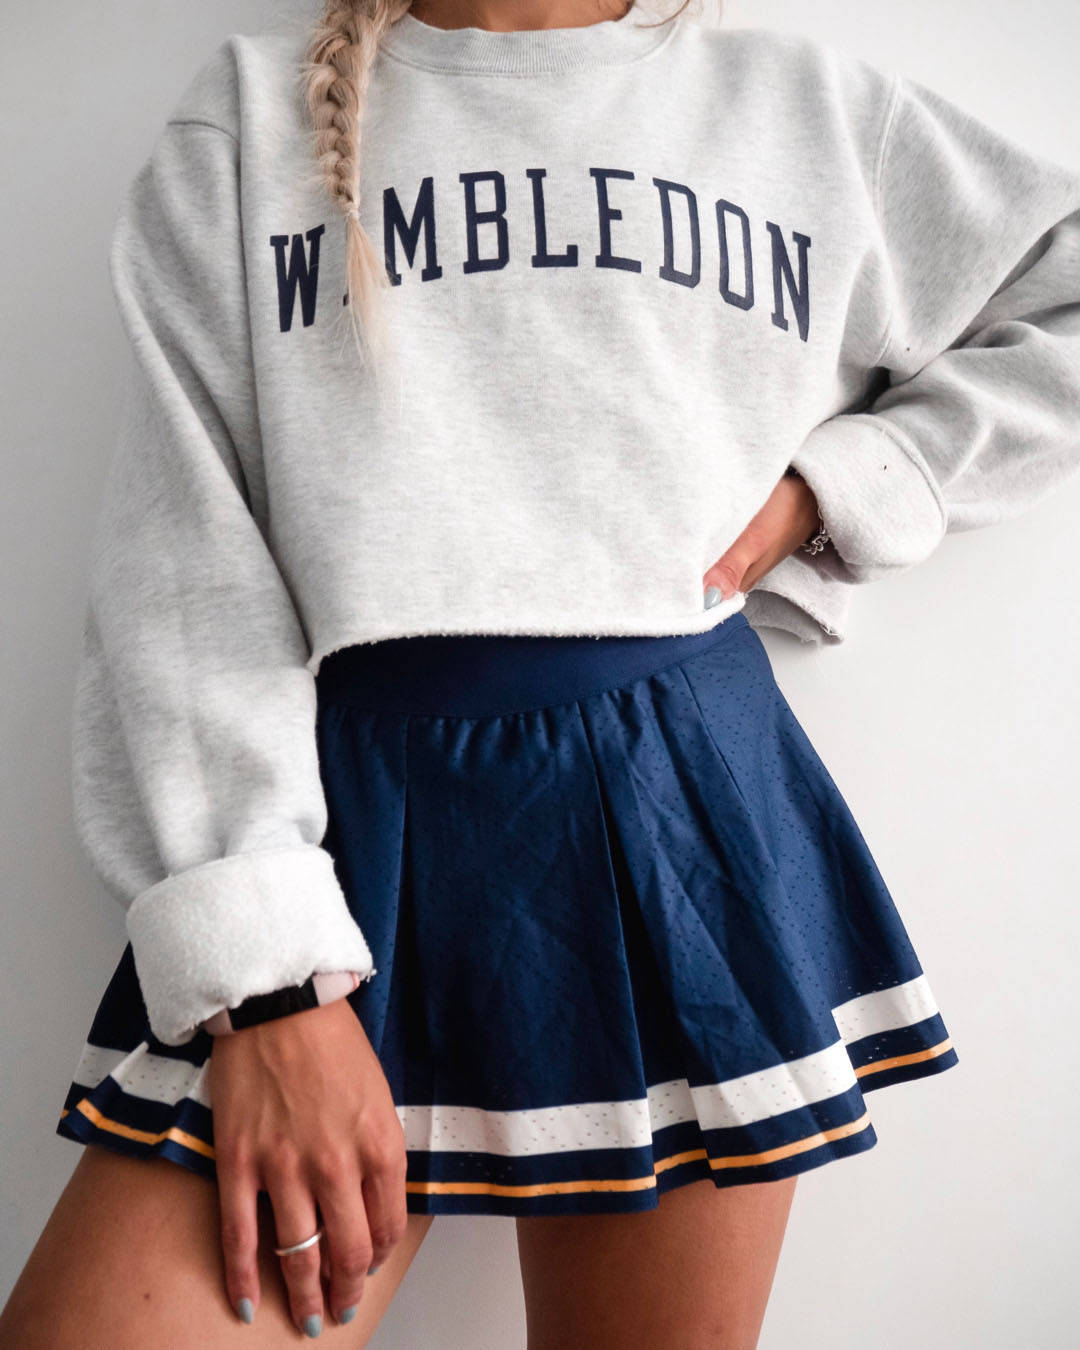 yasmin stefanie wimbledon slogan jumper tennis skirt style